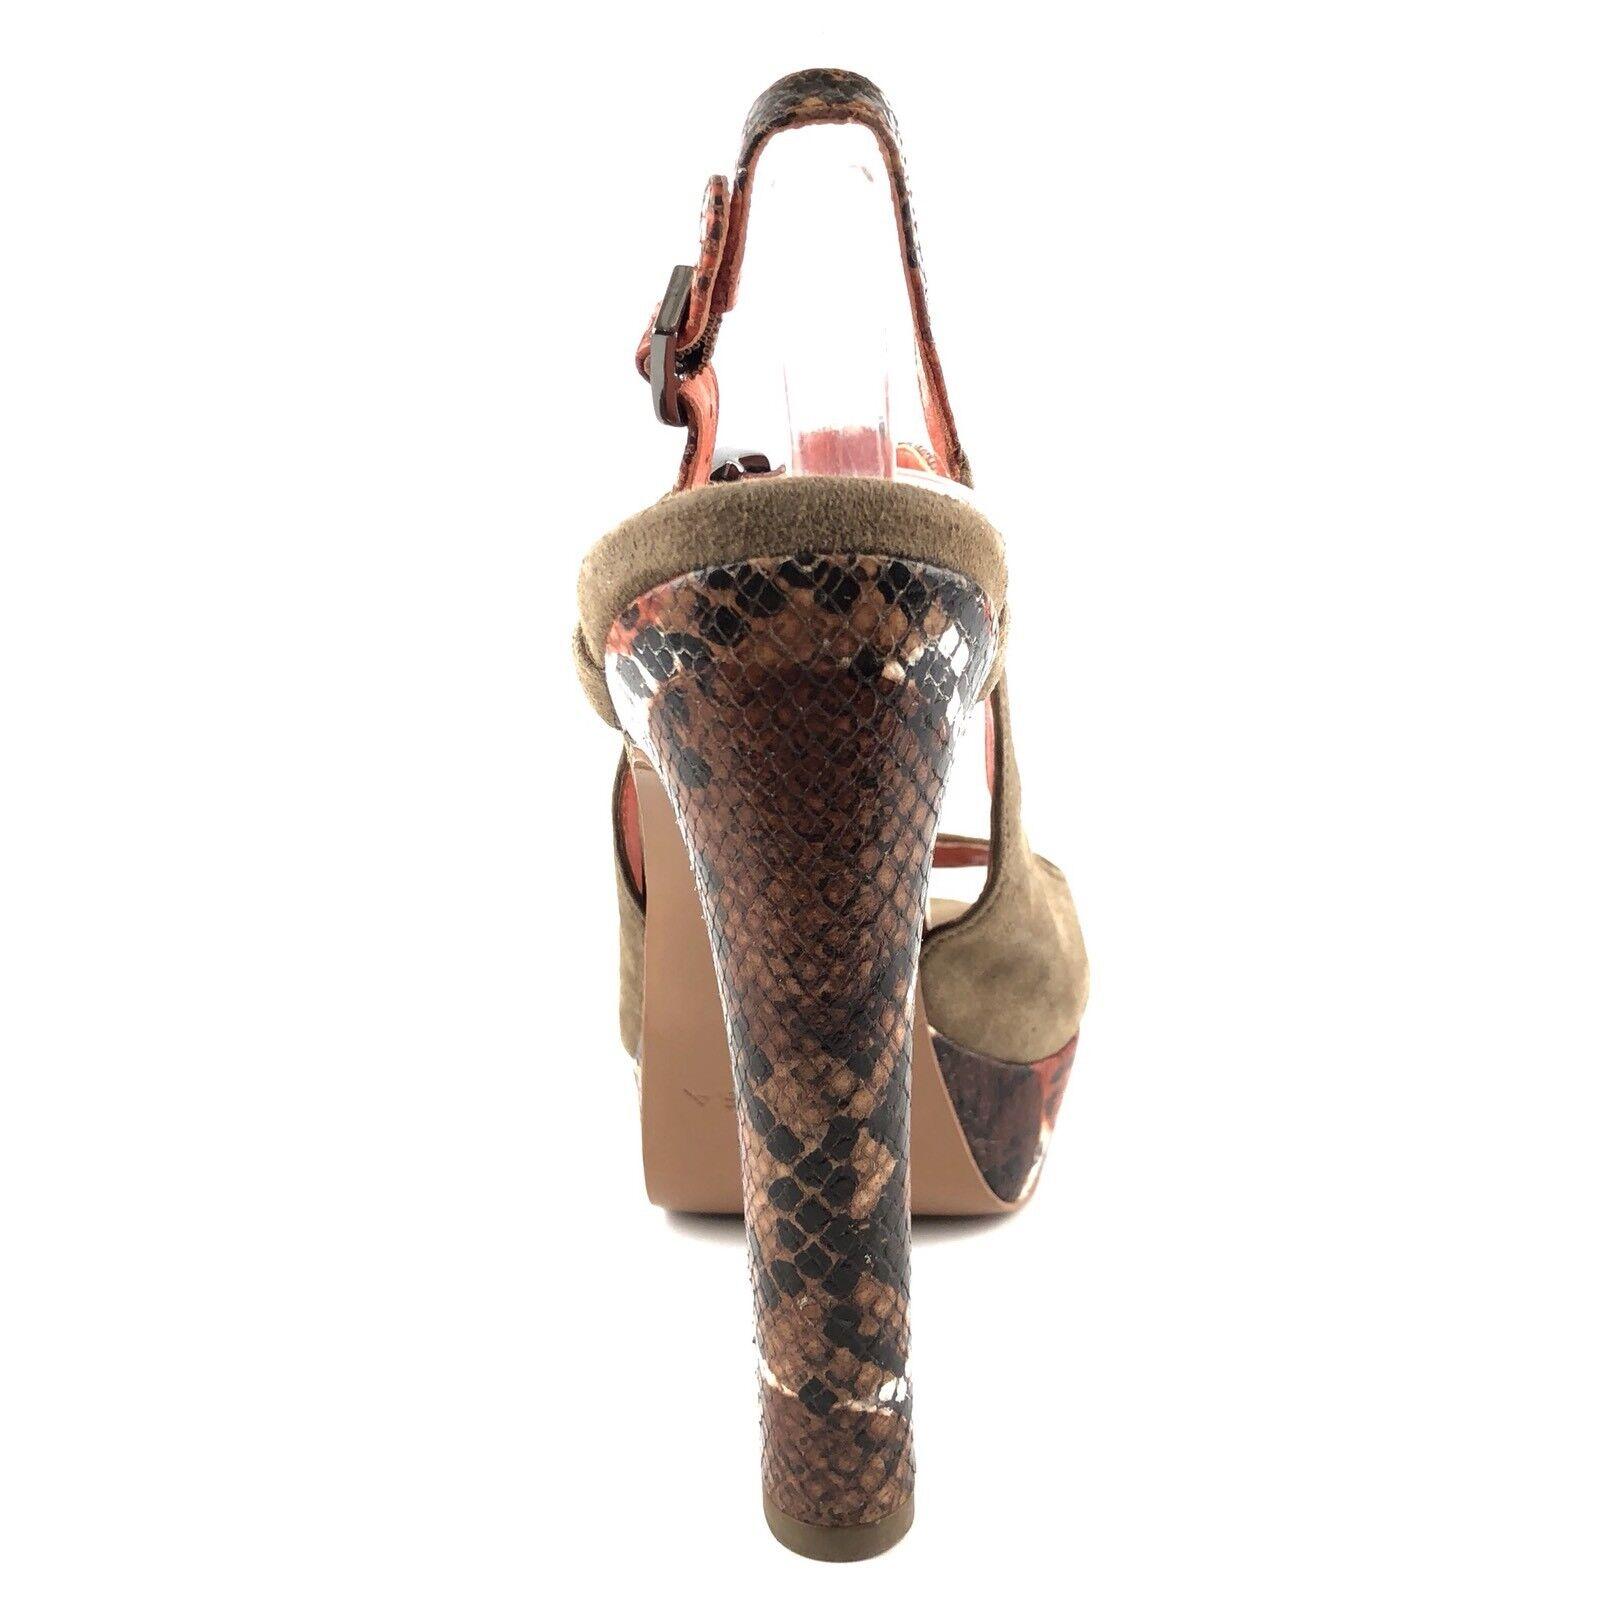 Via Via Via Spiga Braun Suede Ankle Strap Reptile Print Sandales Damenschuhe Größe 8 M f8ceca